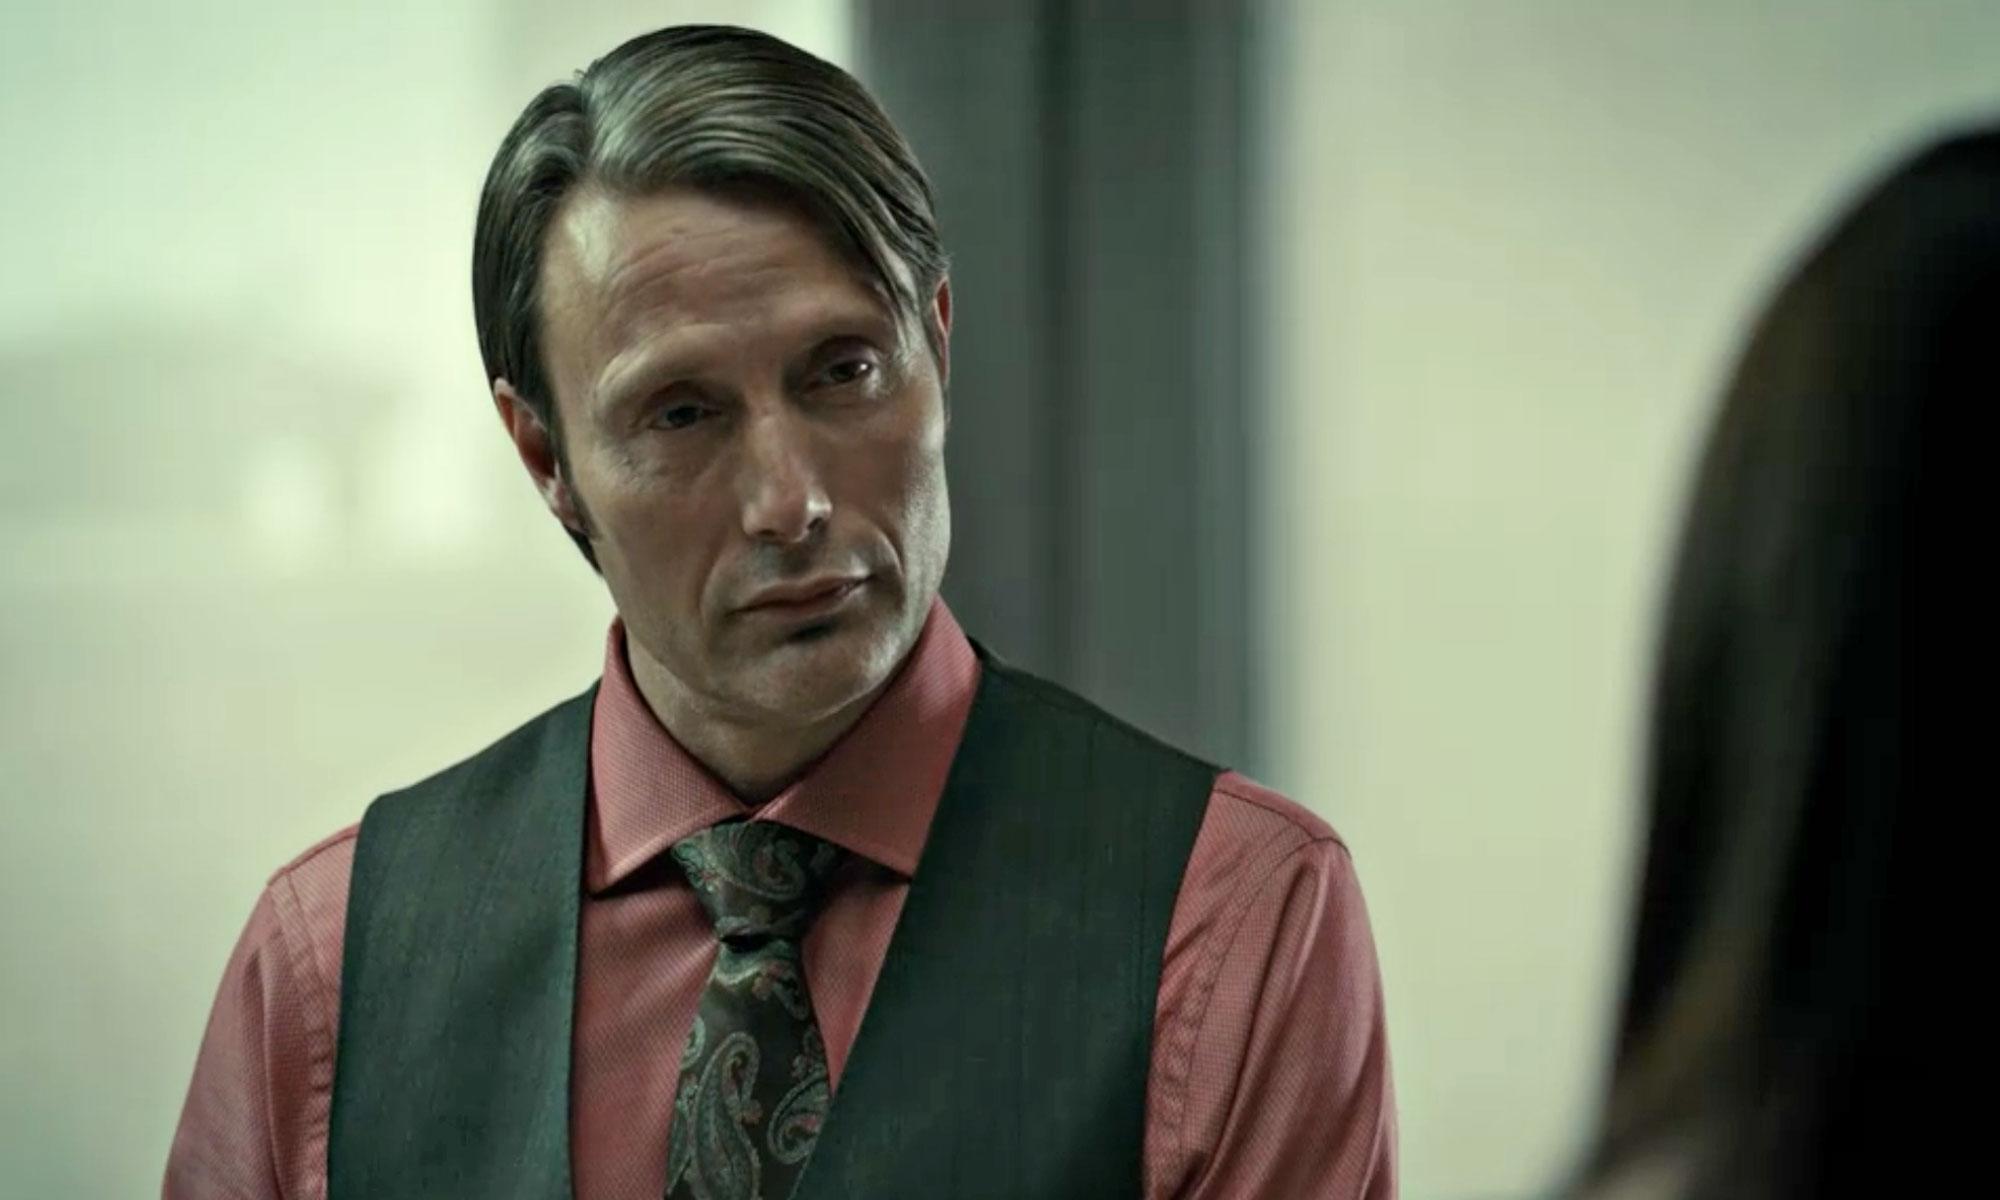 Hannibal waistcoat